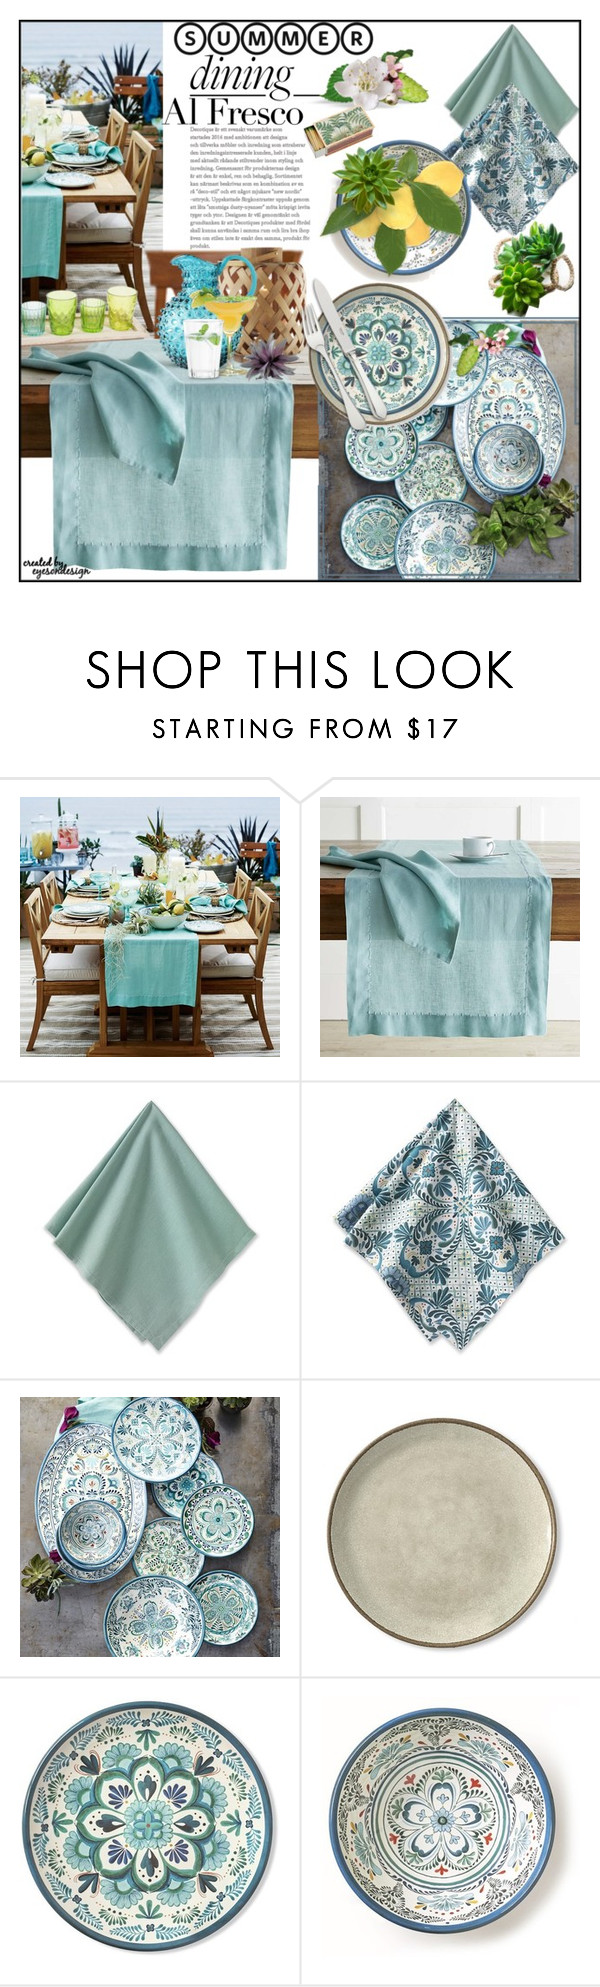 """Summer Outdoor Dining"" by eyesondesign ❤ liked on Polyvore featuring interior, interiors, interior design, home, home decor, interior decorating, Rosendahl, Shandell's, interiordesign and TastemastersDesignGroup"